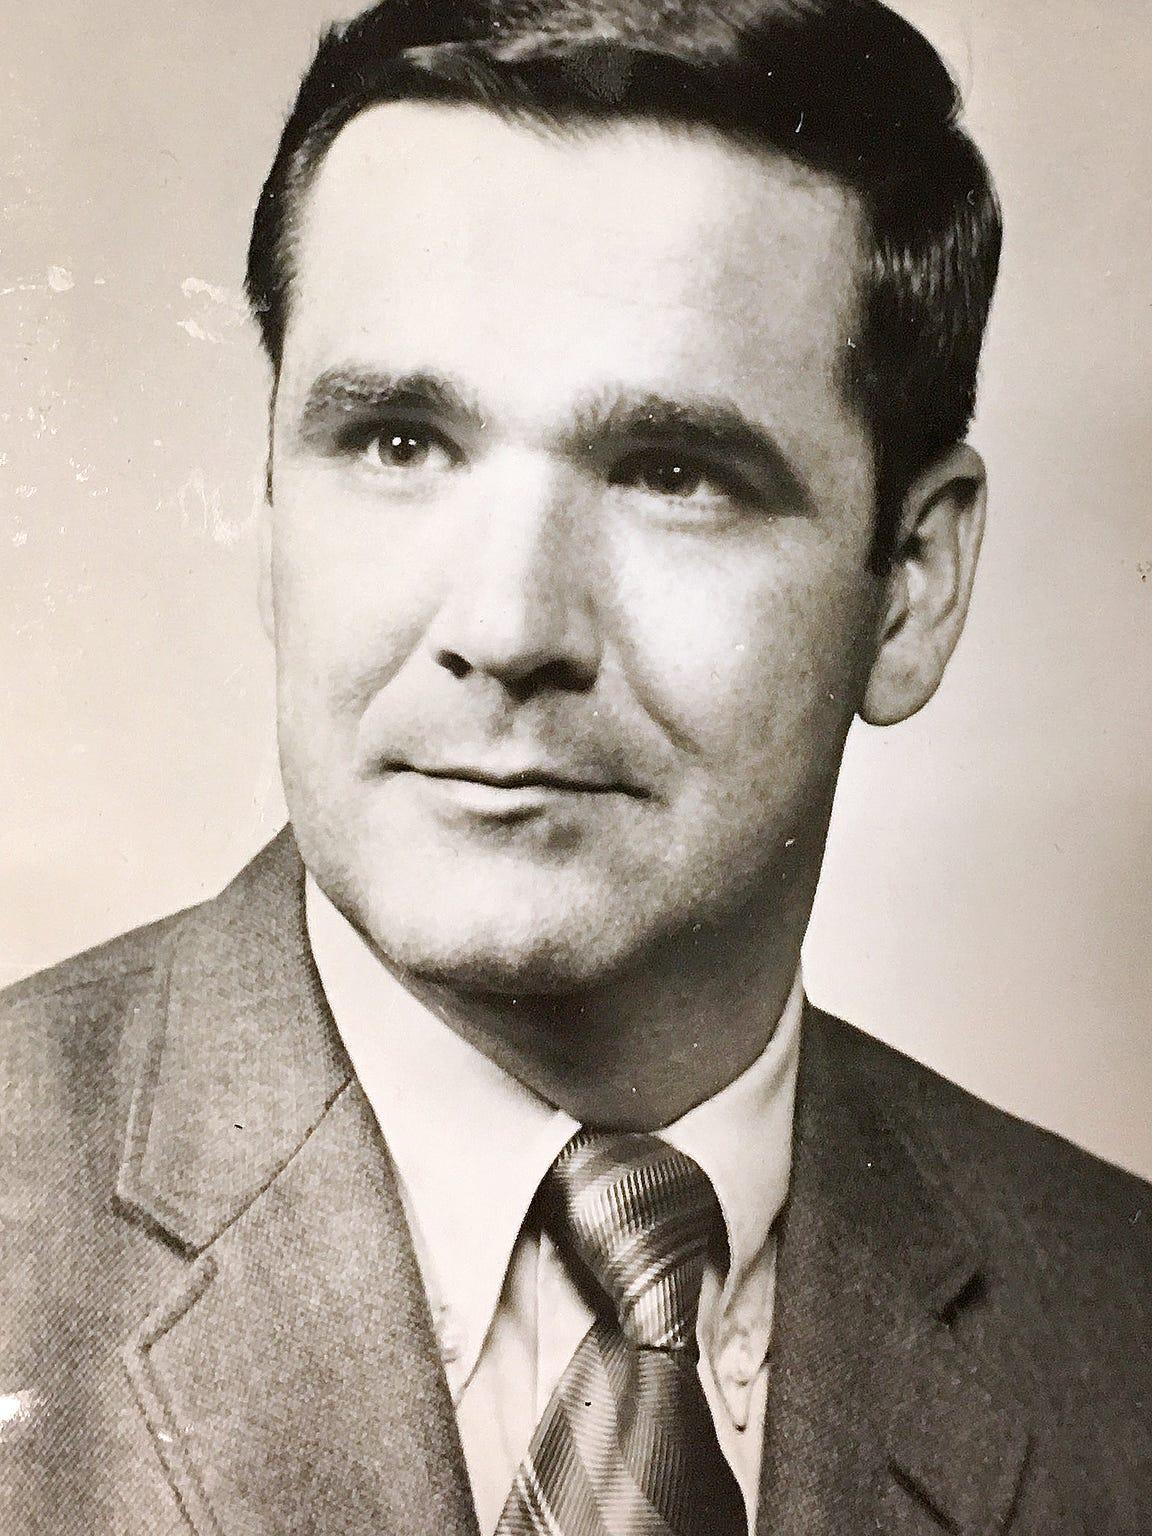 Headshot of Matthew J. Crehan, from 1972. Crehan represented